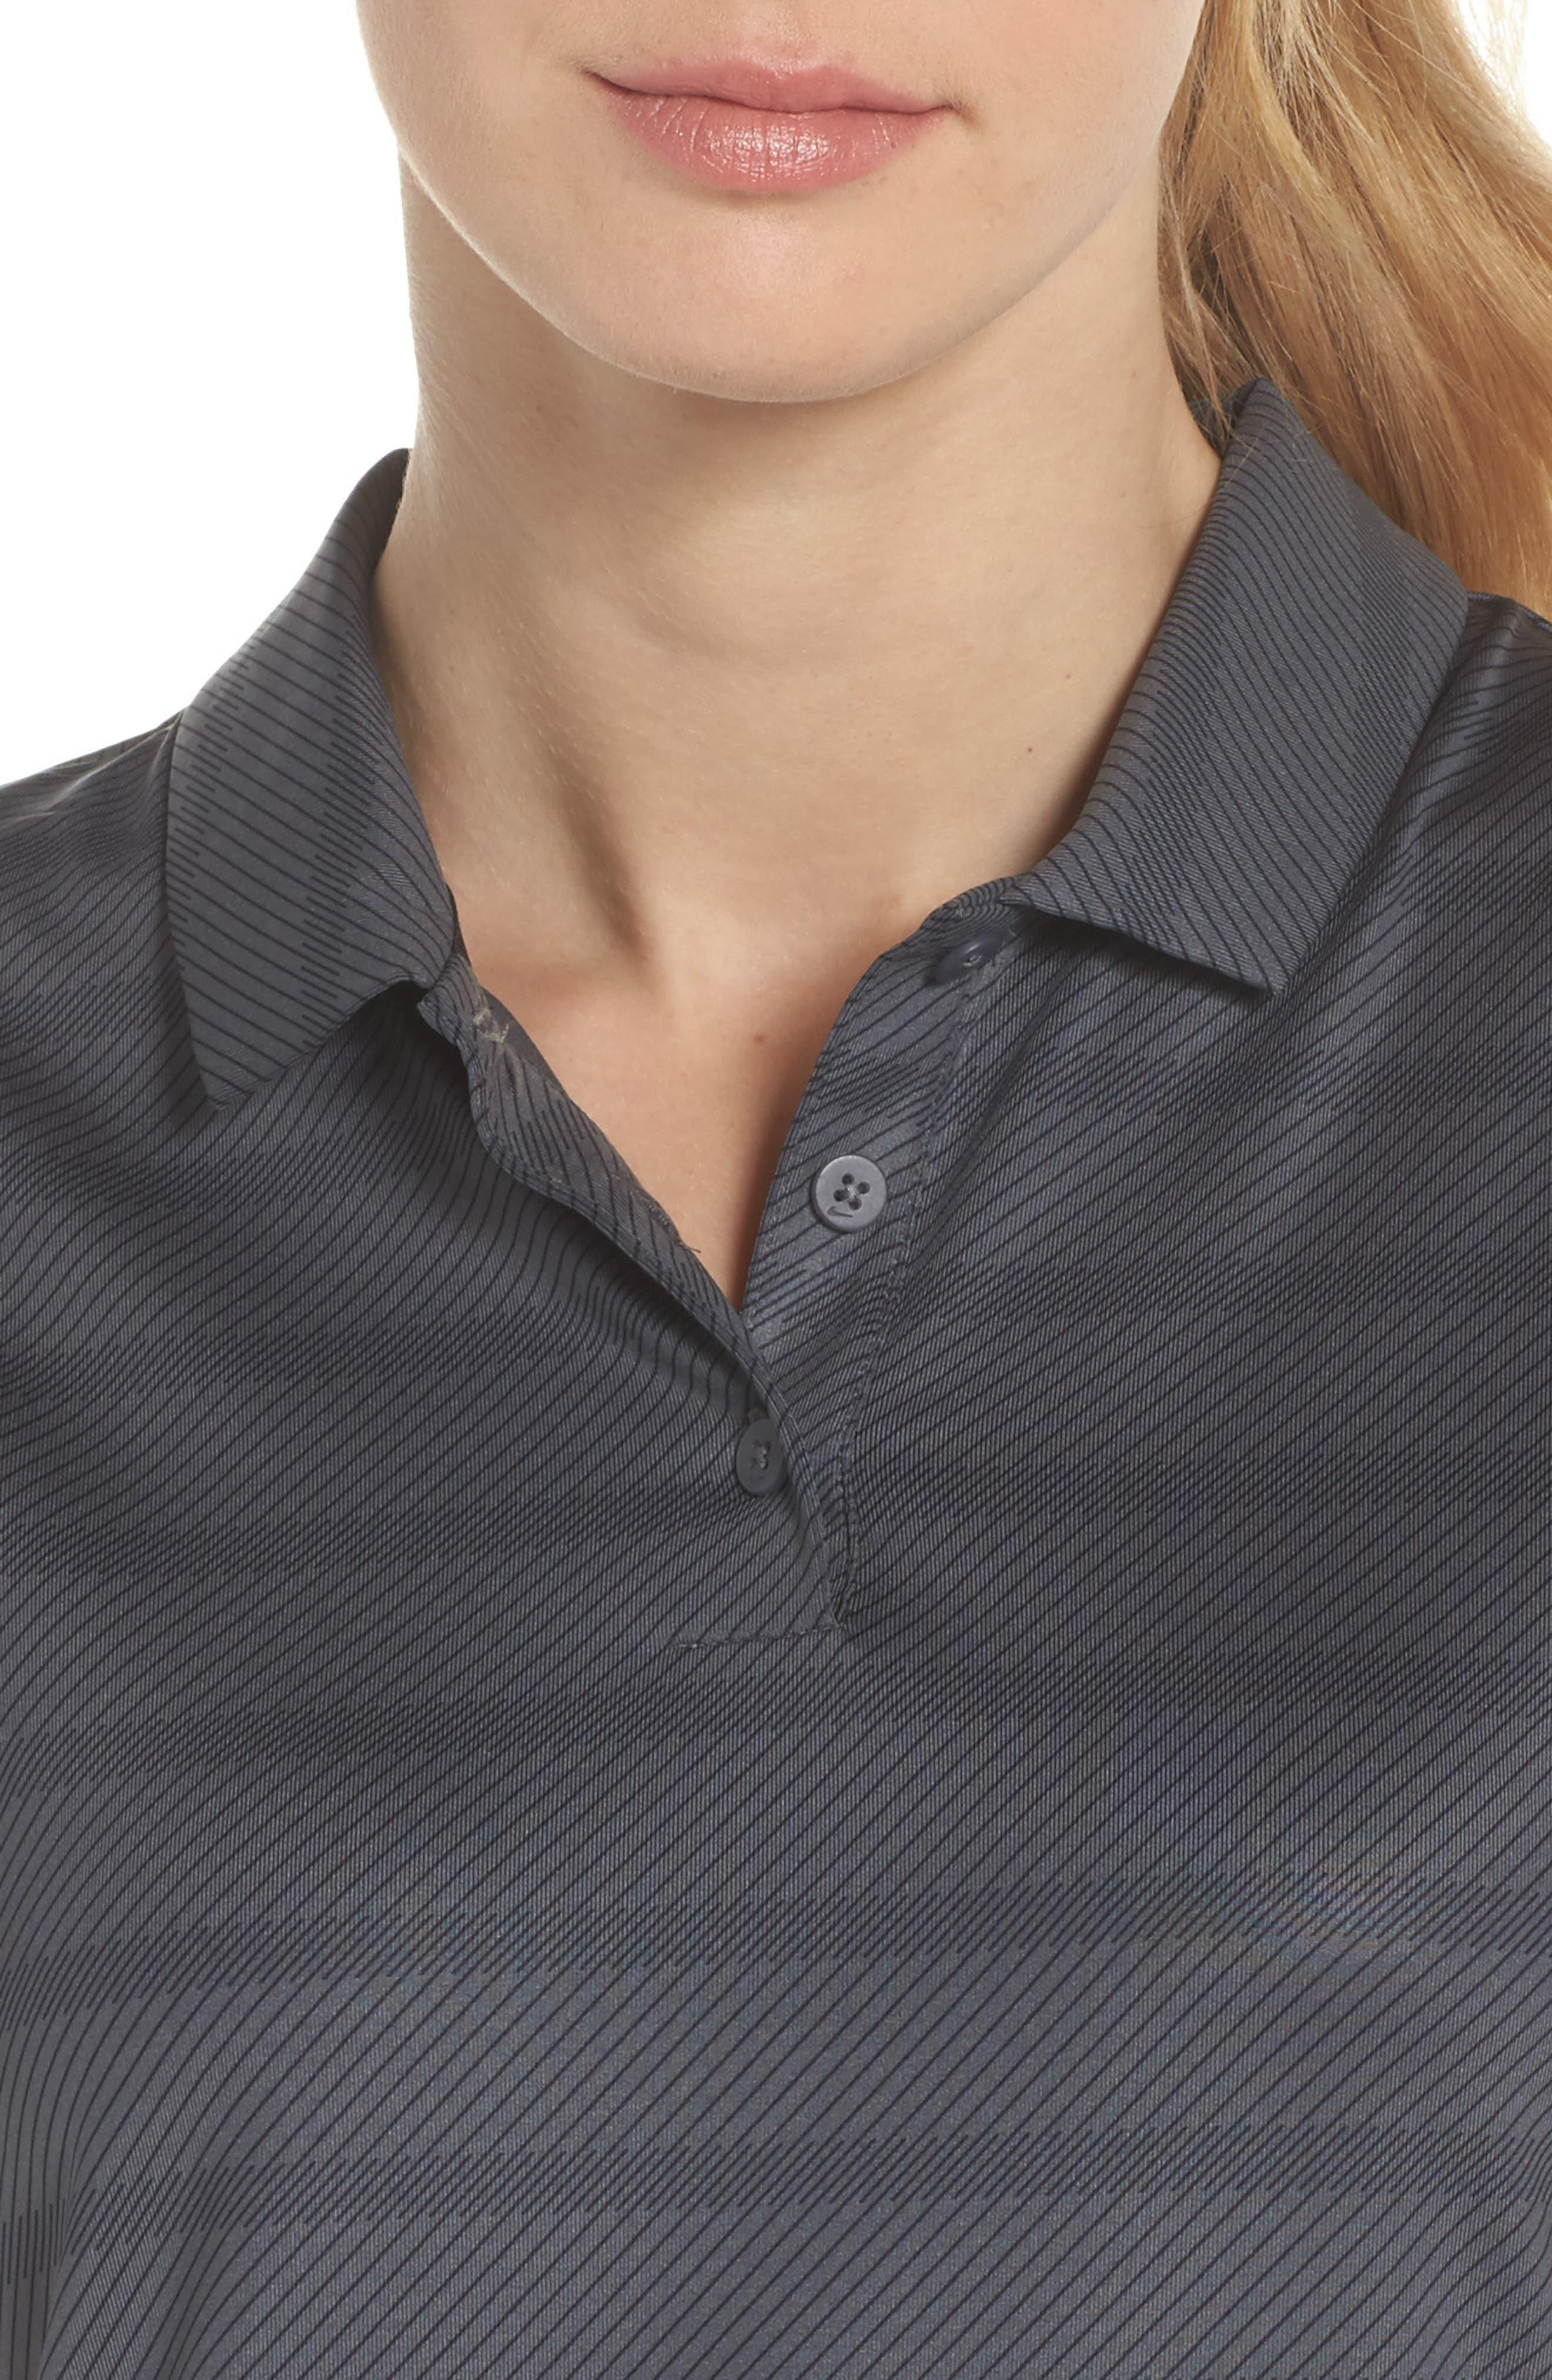 Dry Golf Polo,                             Alternate thumbnail 4, color,                             Dark Grey/ Black/ Black